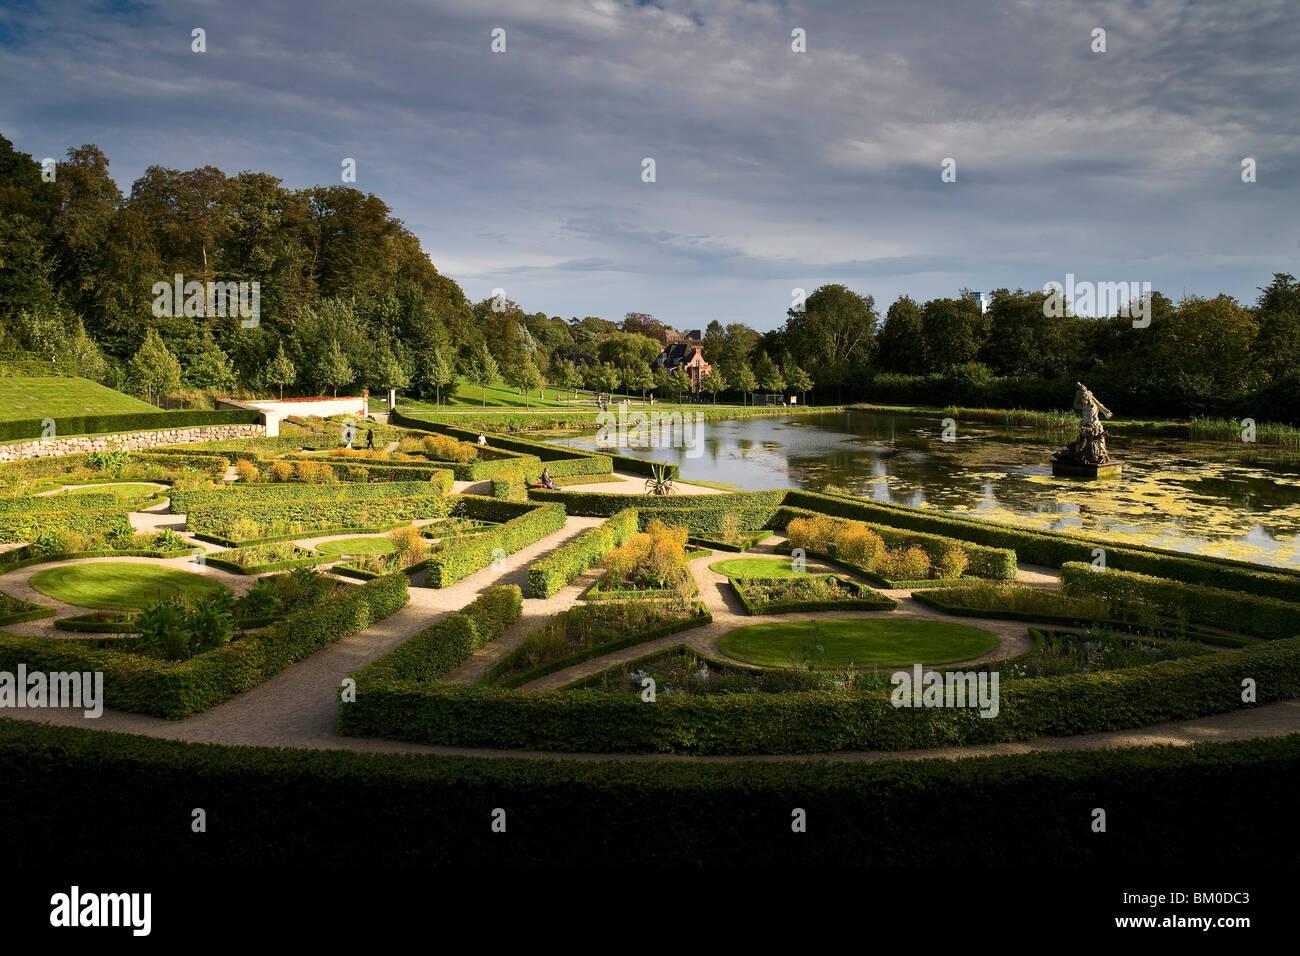 Barock terrazza giardino con laghetto, Neuwerkgarten, Gottorf Castle, Schleswig, Schleswig-Holstein, Germania, Europa Immagini Stock